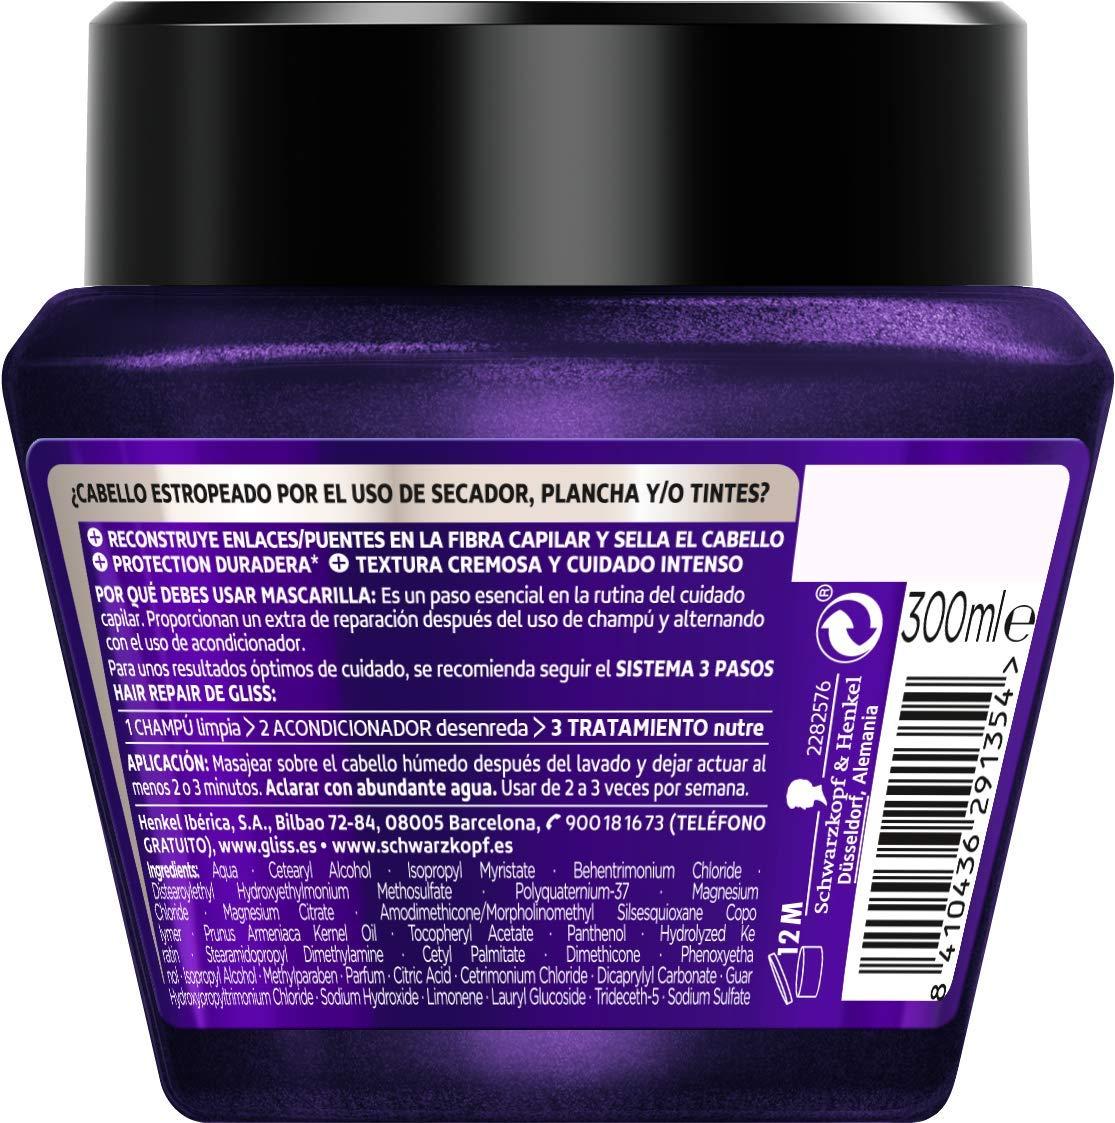 Amazon.com: GLISS FIBER THERAPY keratina líquida mascarilla 300 ml: Beauty